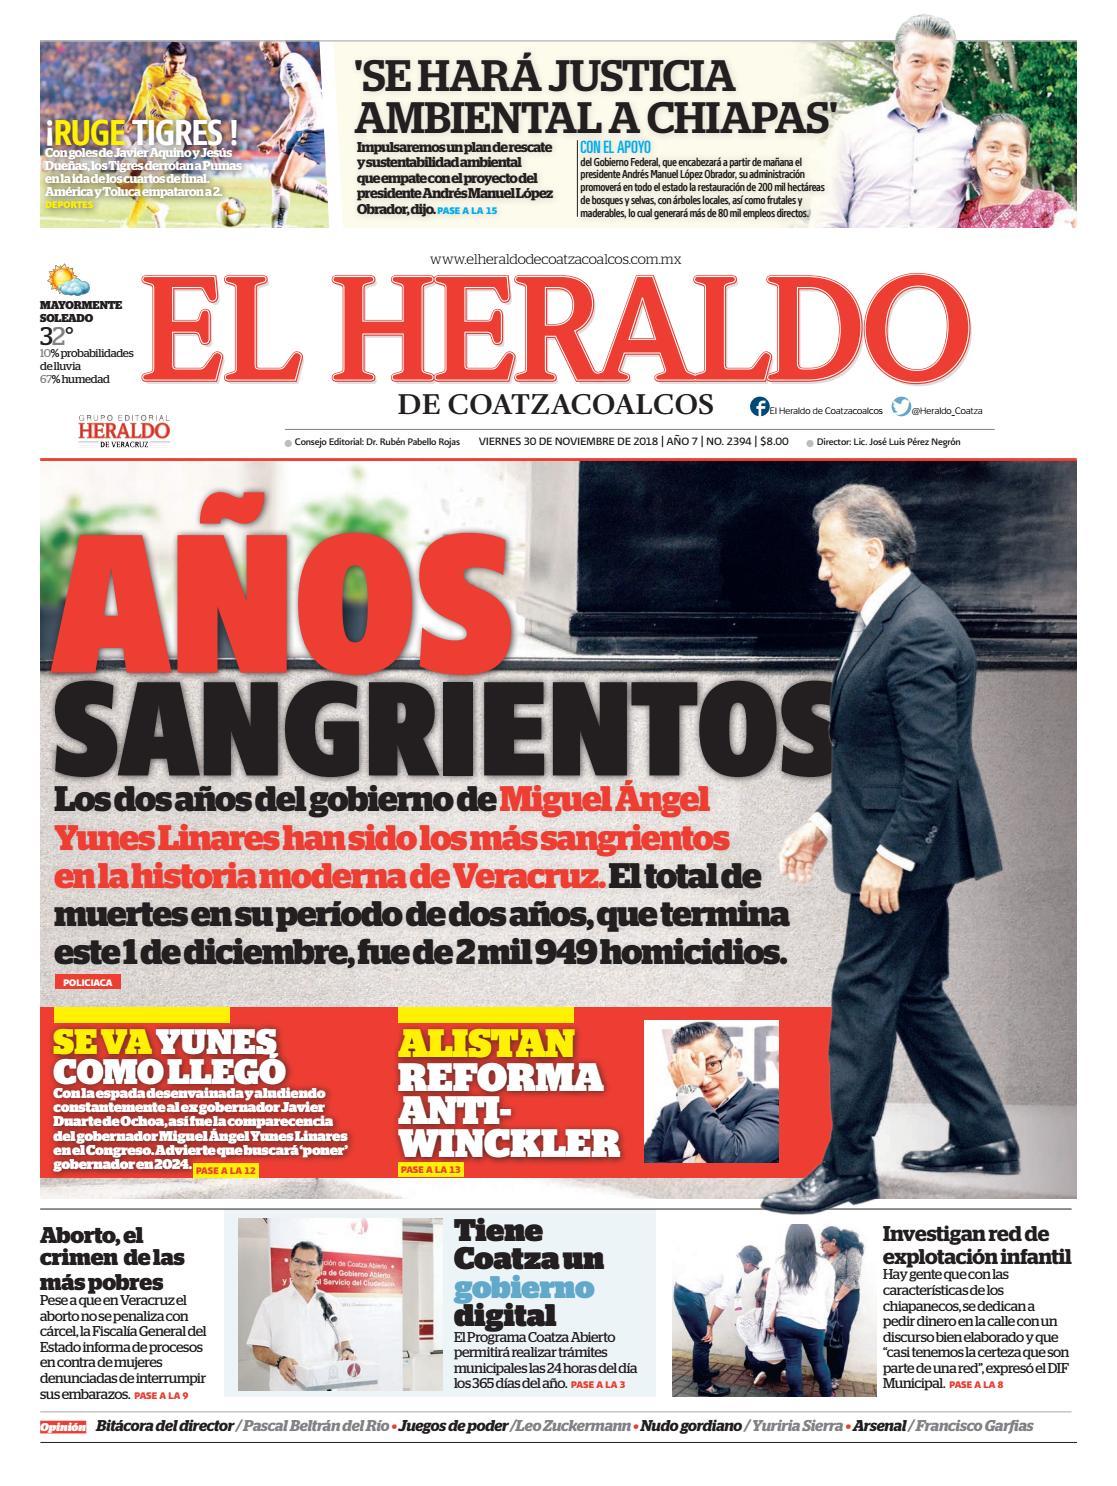 El Heraldo De 30 Noviembre Coatzacoalcos 2018 3ulJ1c5TKF